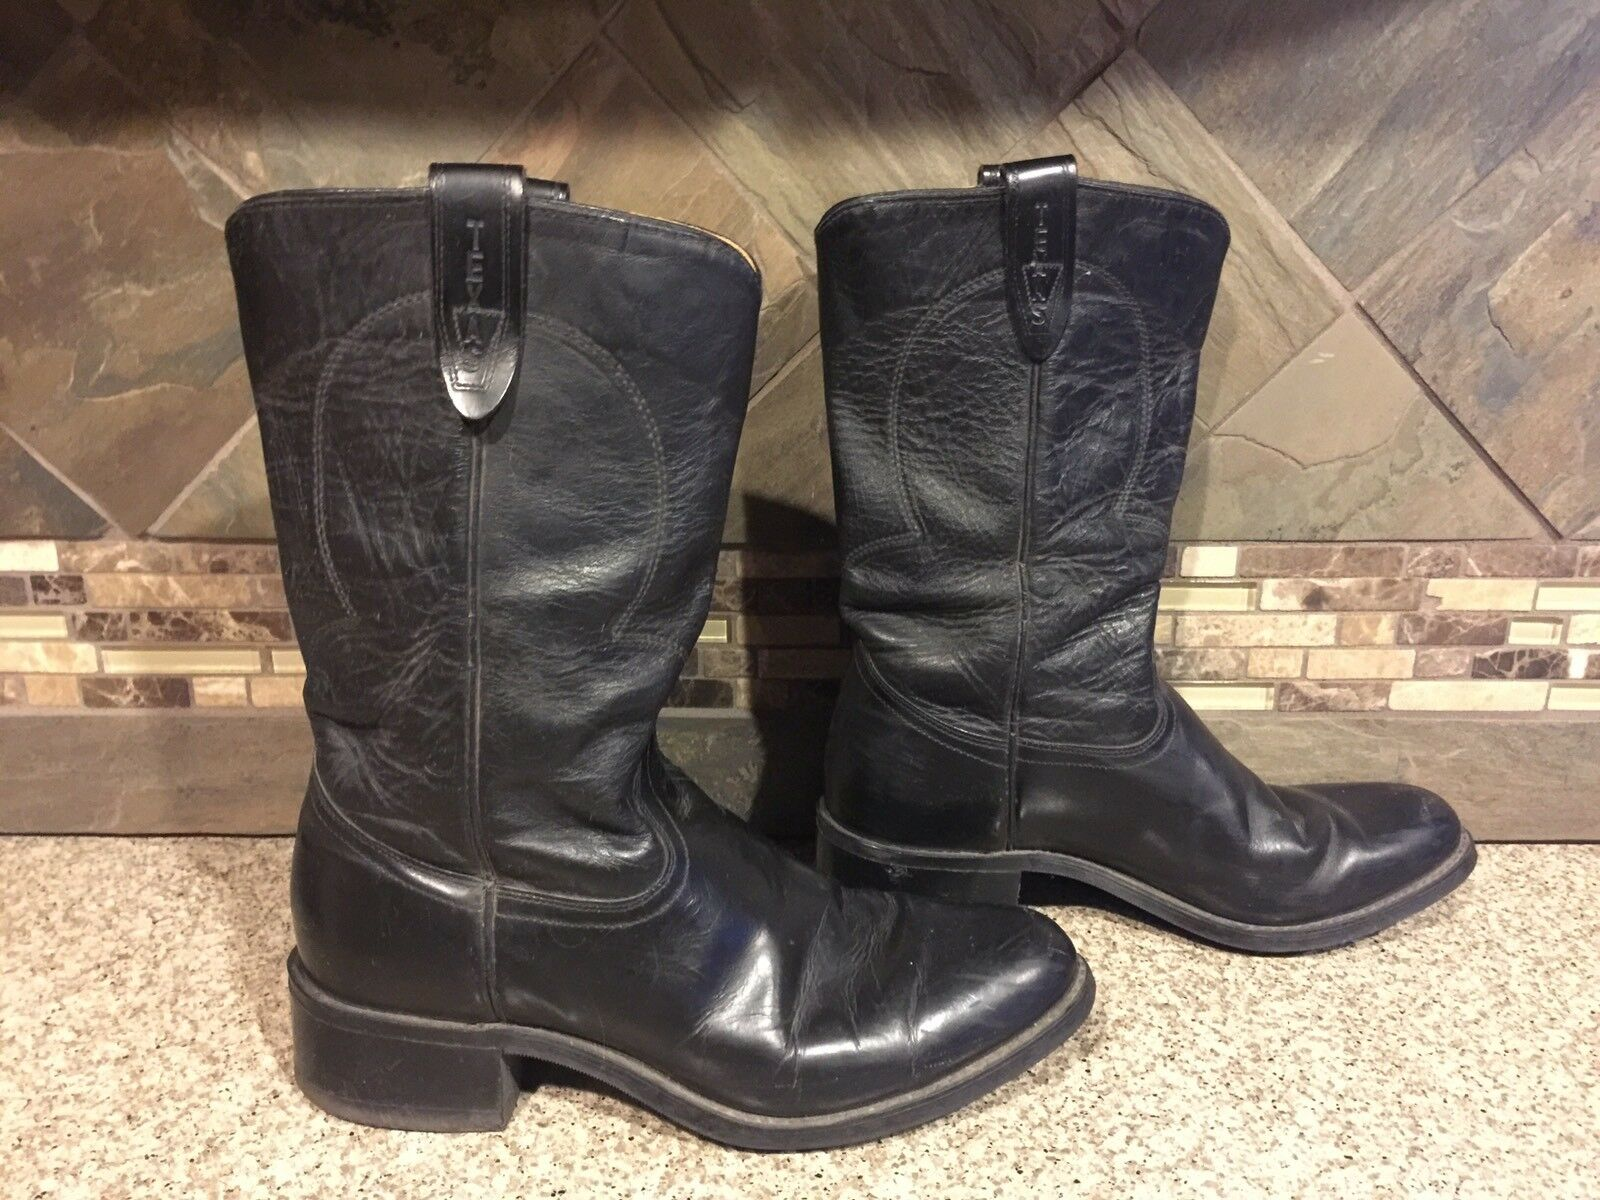 Mens Texas 8300 Sz 8 D Black Leather Cowboy Boots